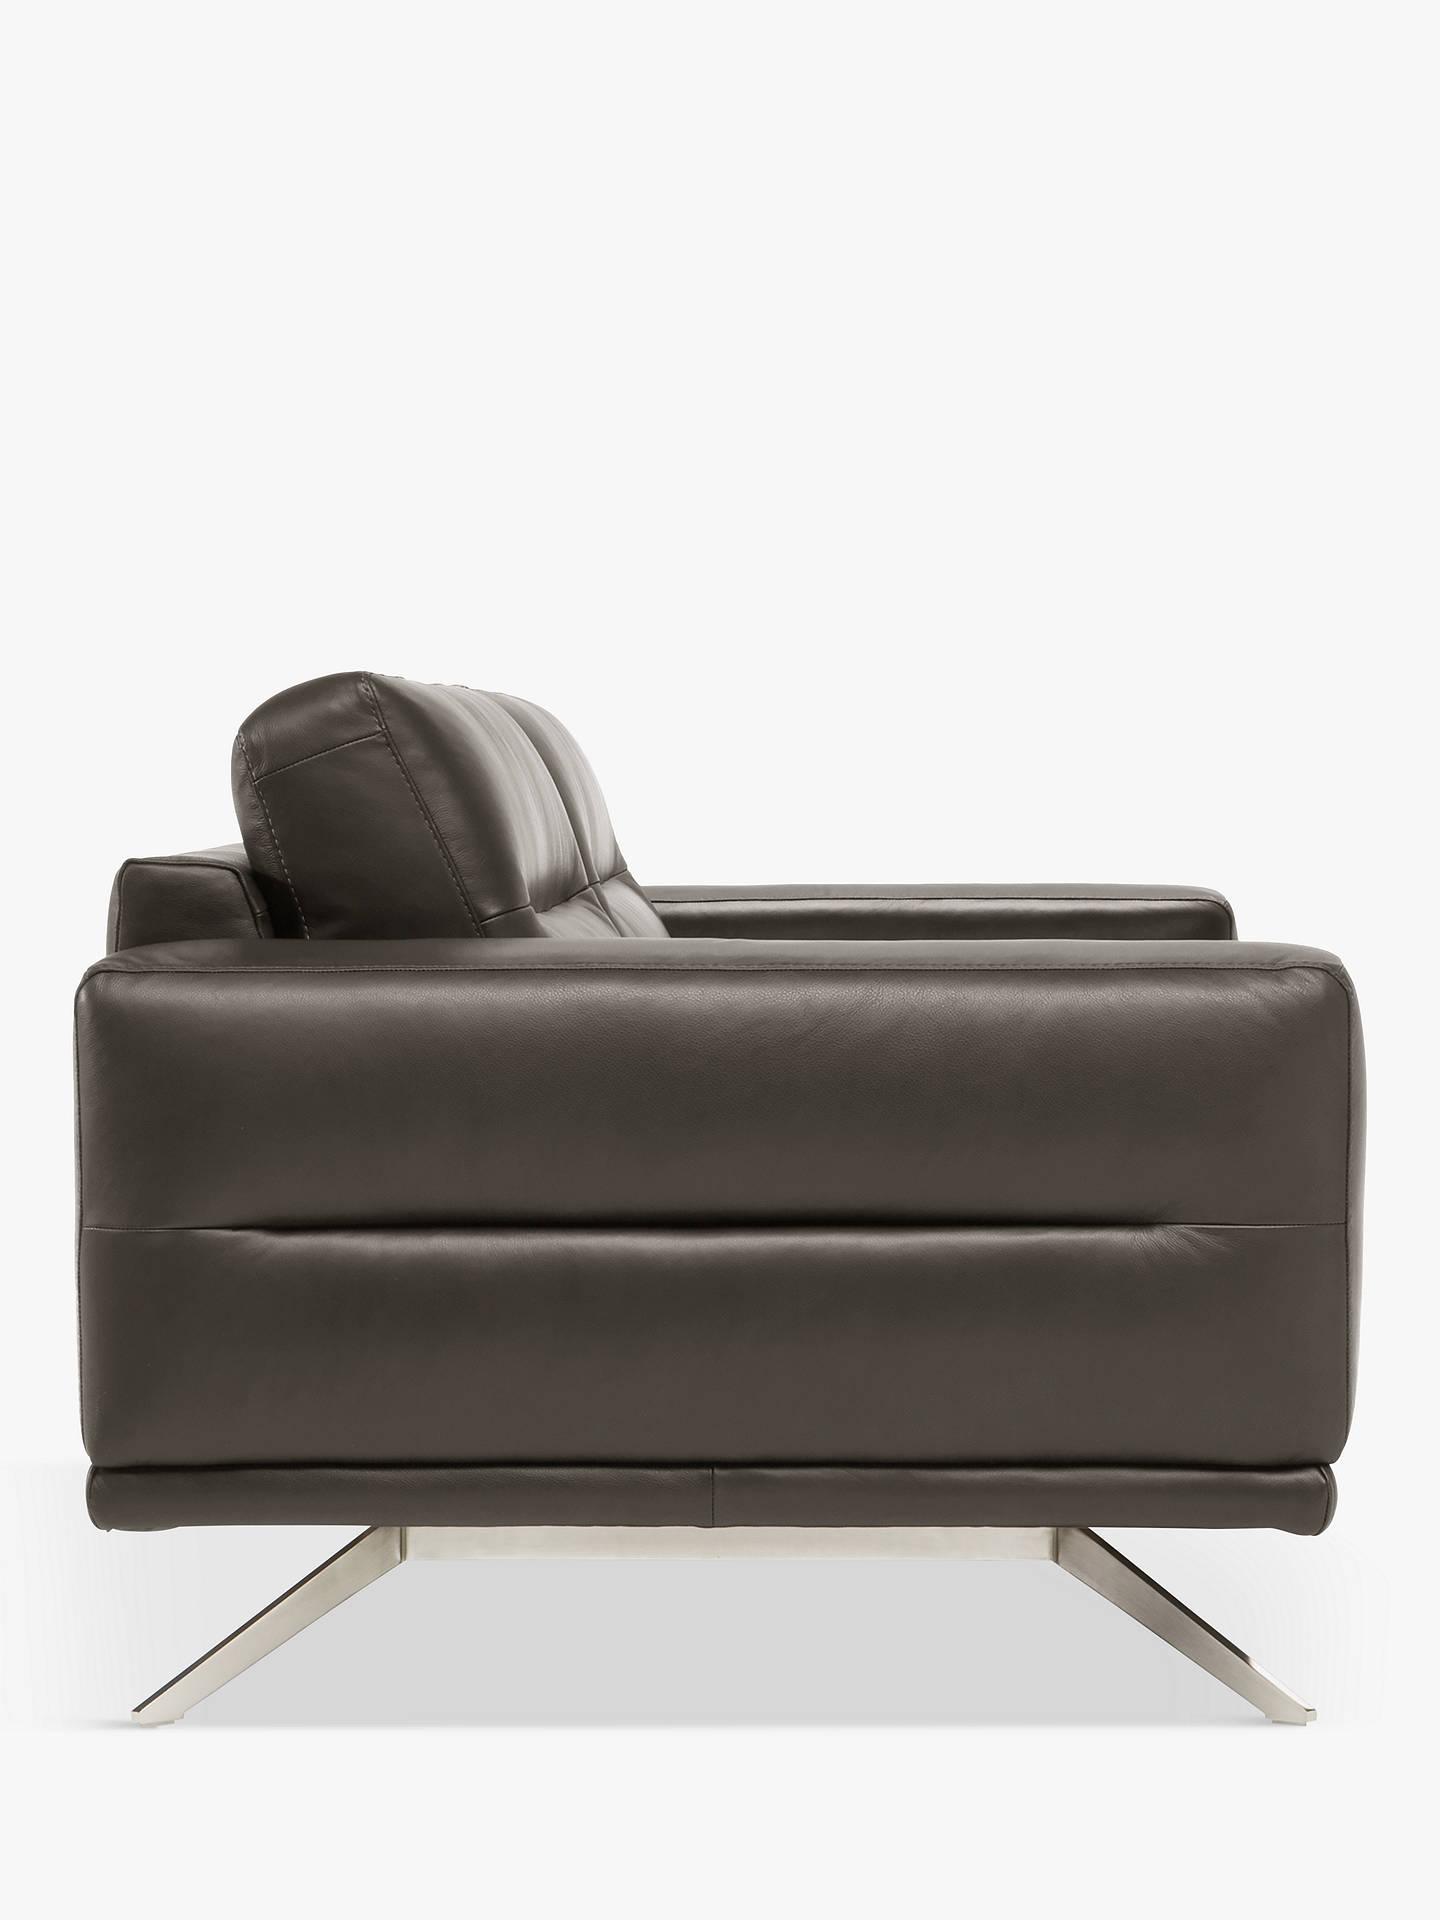 Super Natuzzi Timido 009 Large 3 Seater Leather Sofa Nickel Leg Download Free Architecture Designs Scobabritishbridgeorg